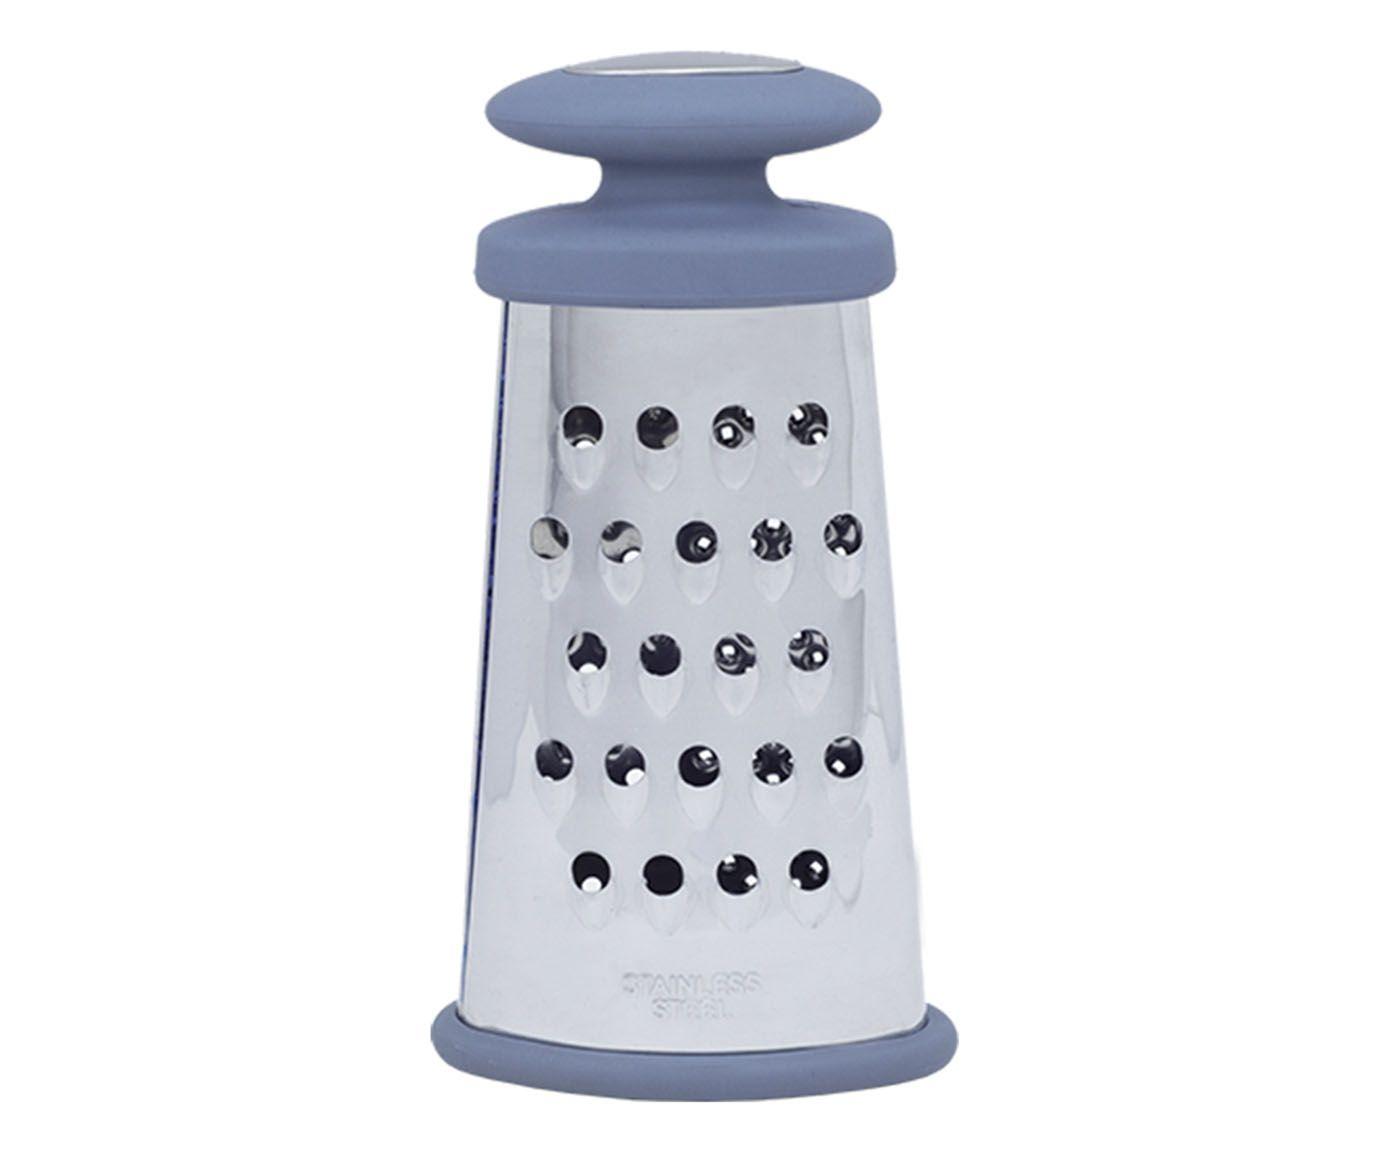 Ralador em Inox Sweet Azul - 8X15,5cm | Westwing.com.br